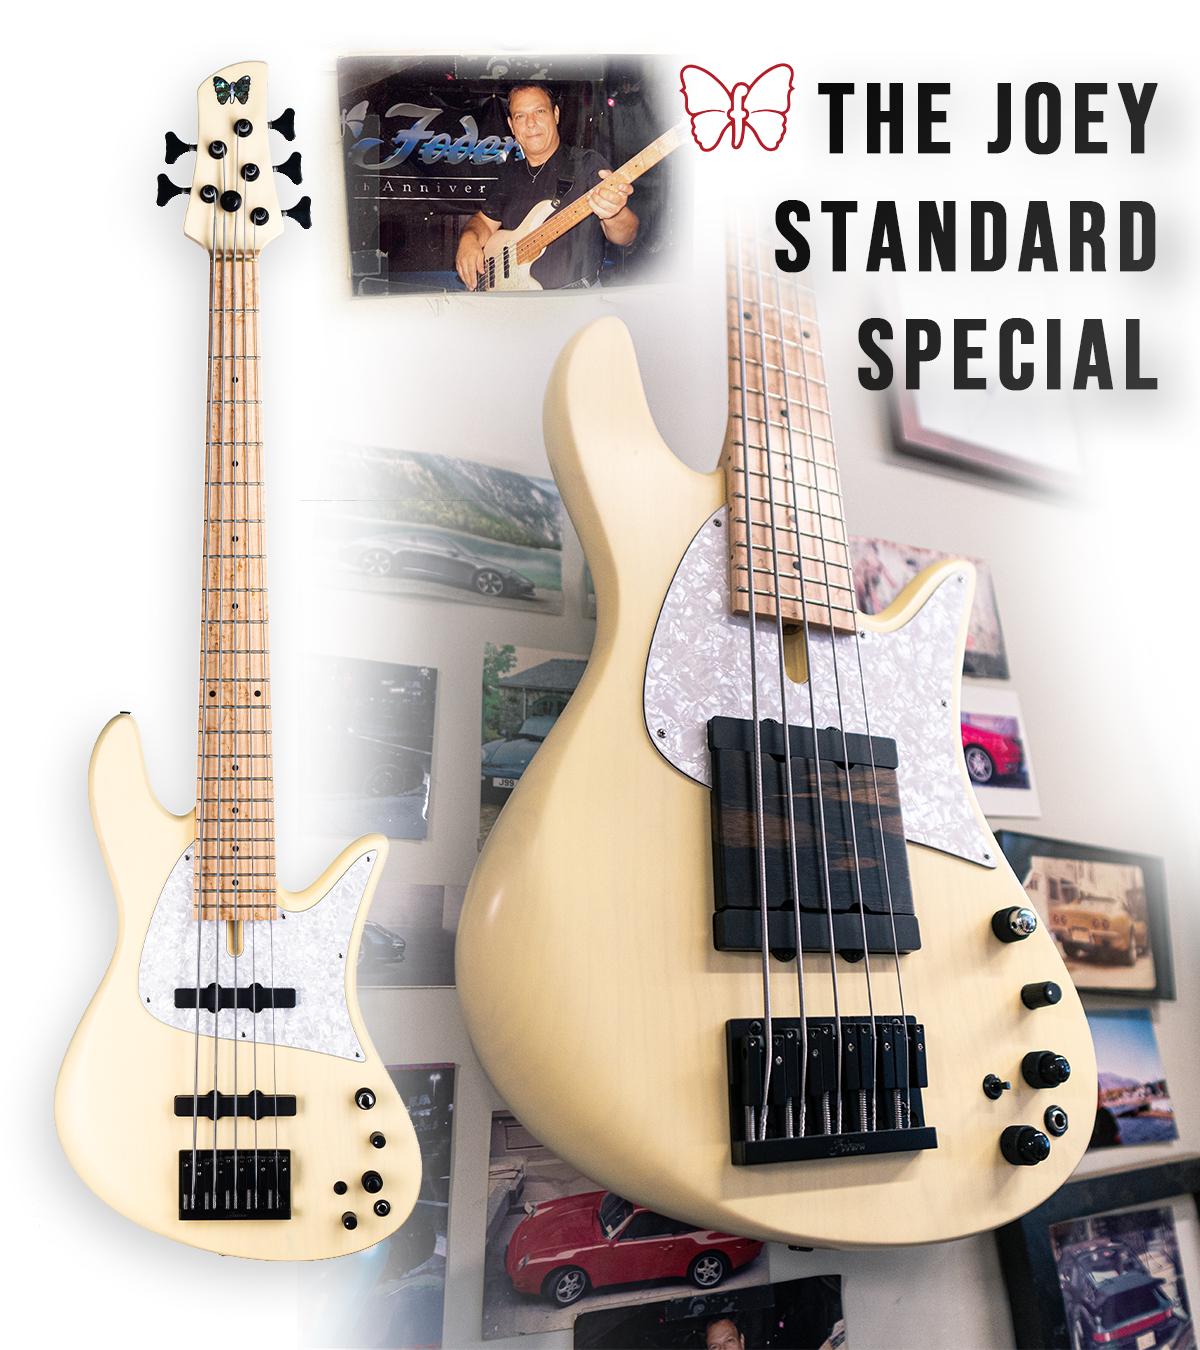 5-String Joey Standard Special Banner